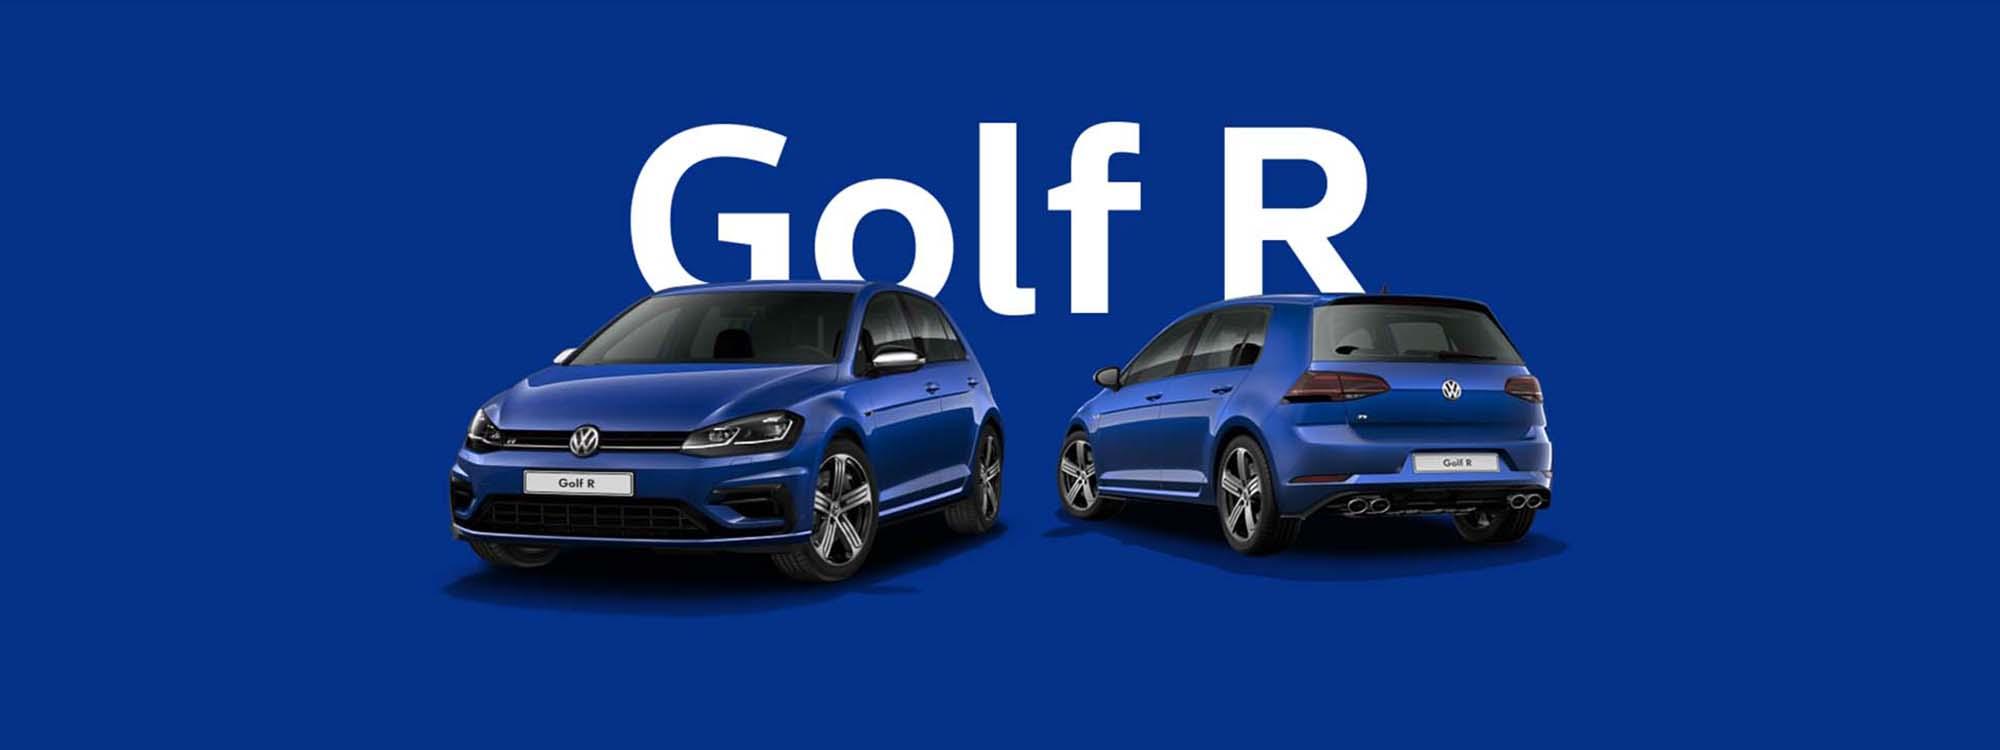 Golf R